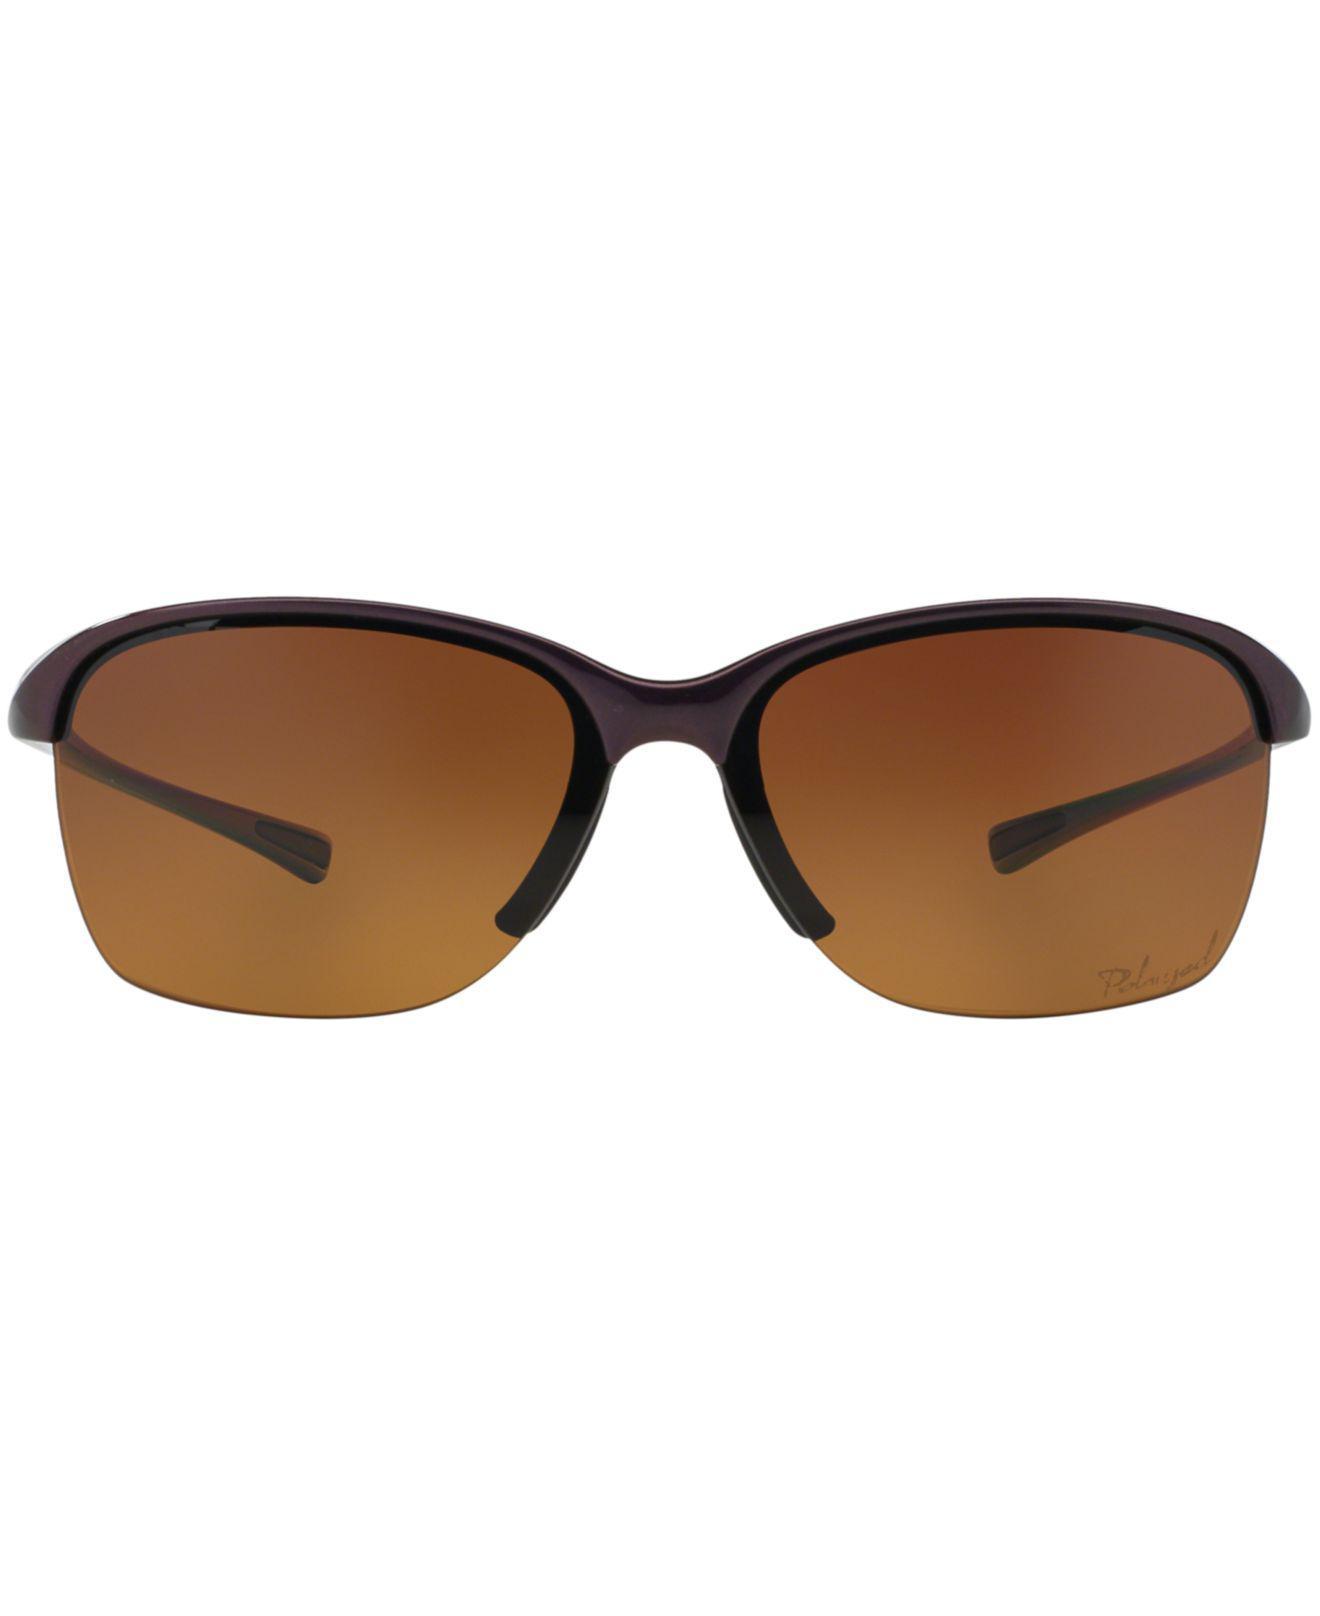 c1dfc51179bbf discount oakley womens unstoppable polarized sunglasses 9097a 41998   switzerland lyst oakley womens sunglasses oo9191 unstoppable in purple  4e733 a5683